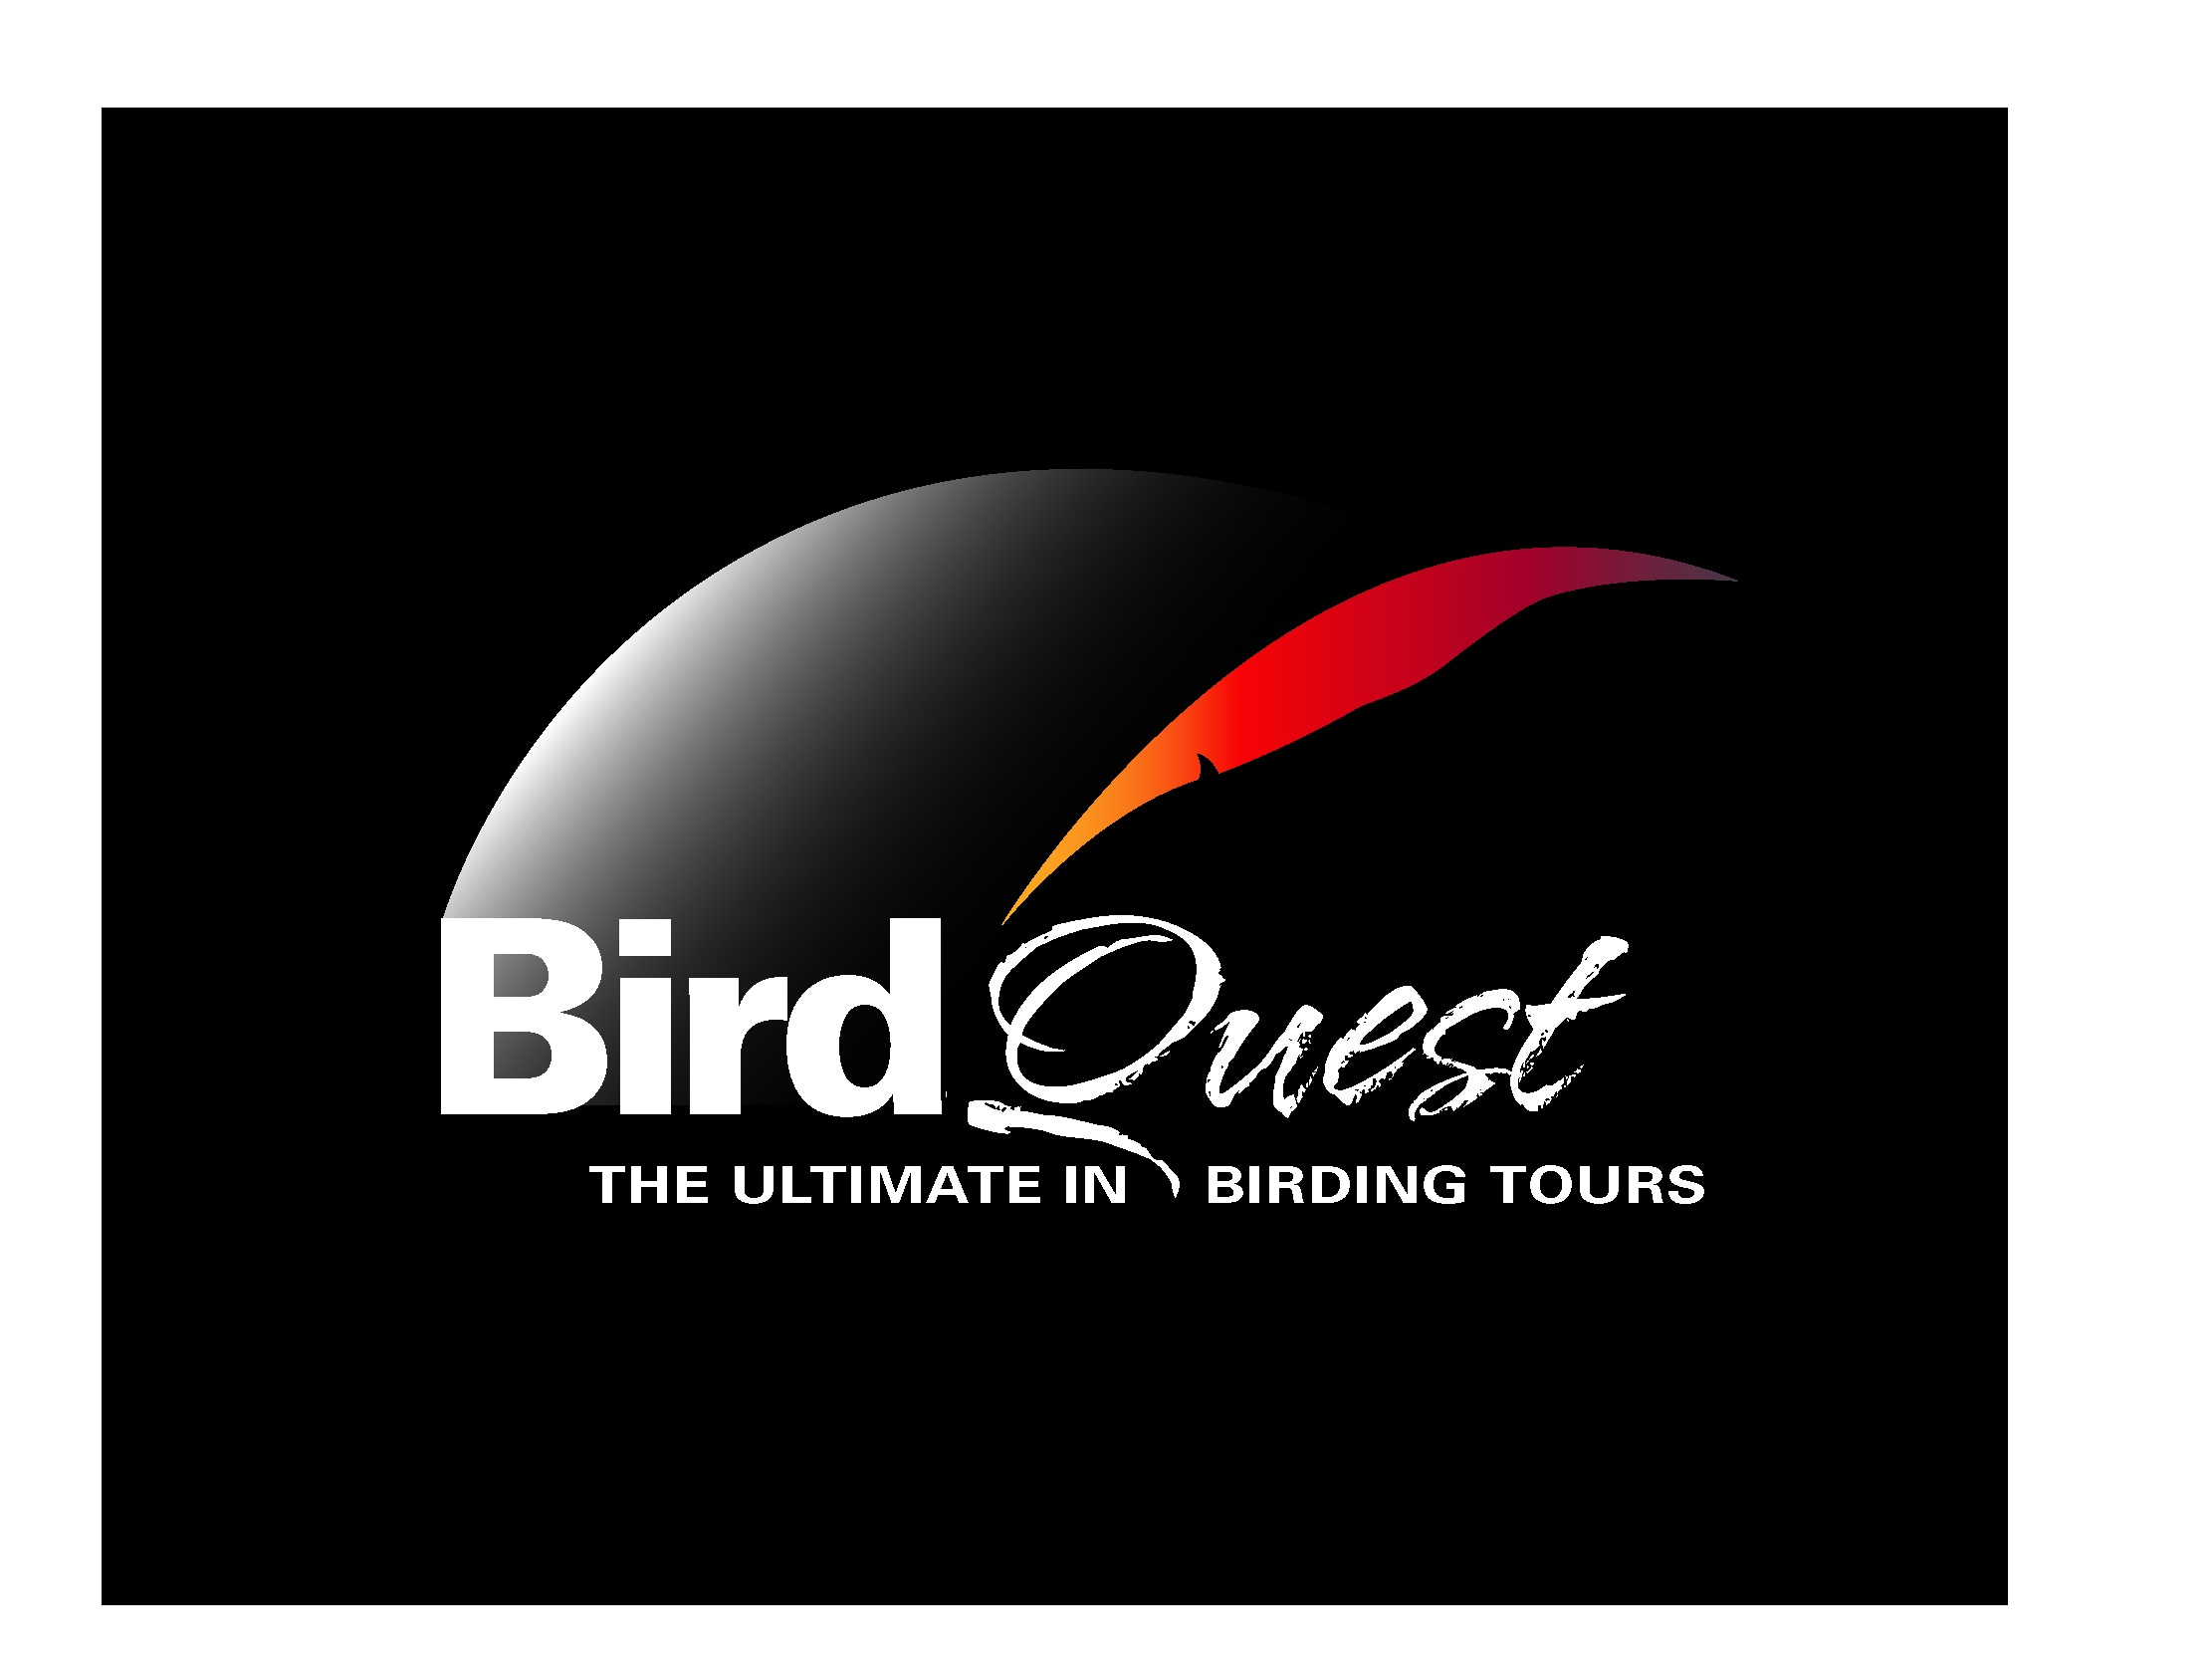 birdquest_logo